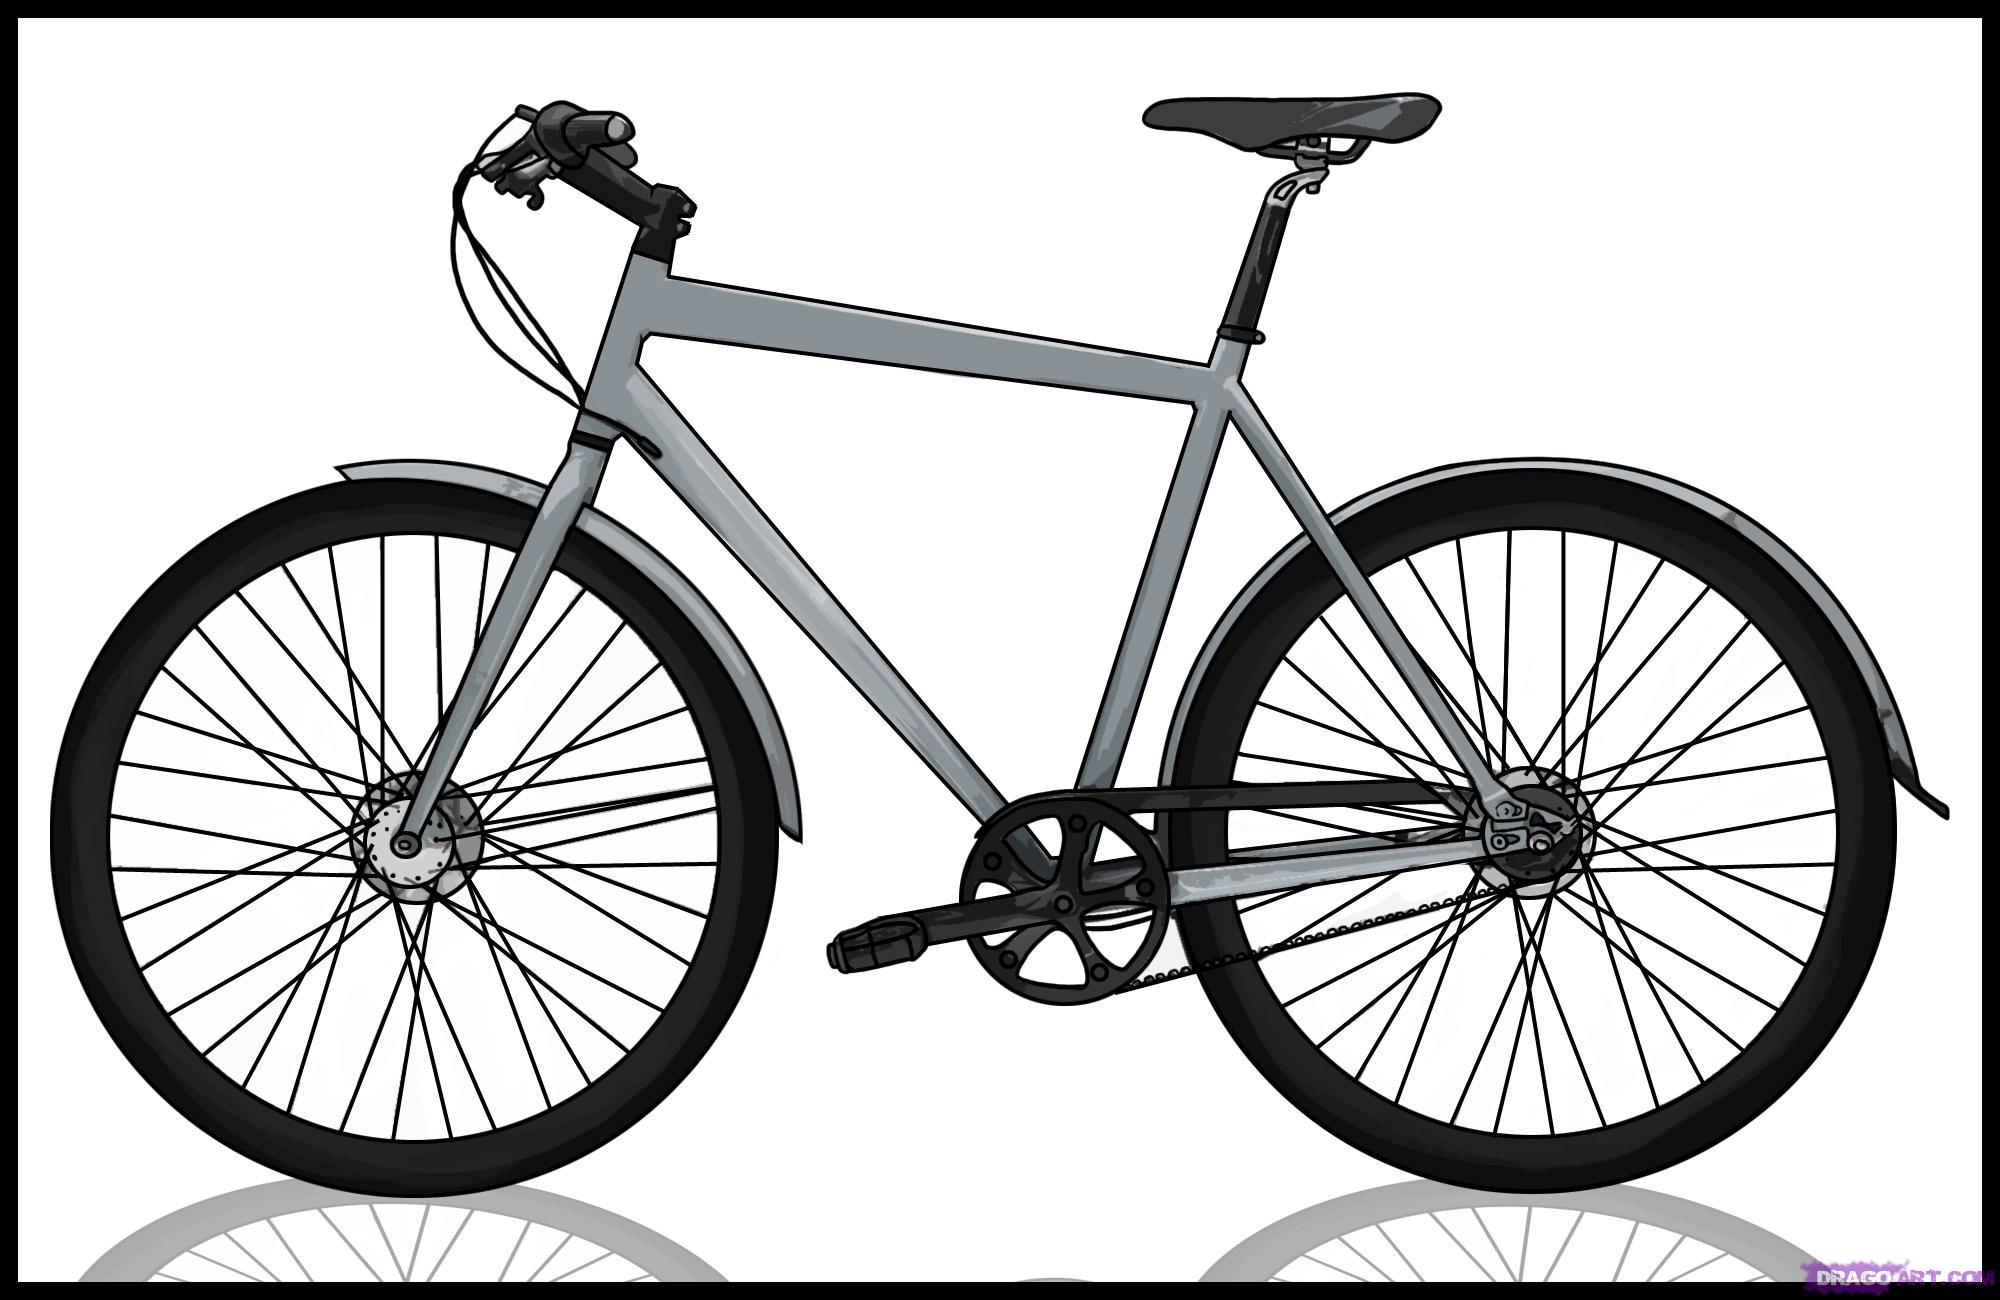 Drawn bike To Culture Pop Stuff Bicycle